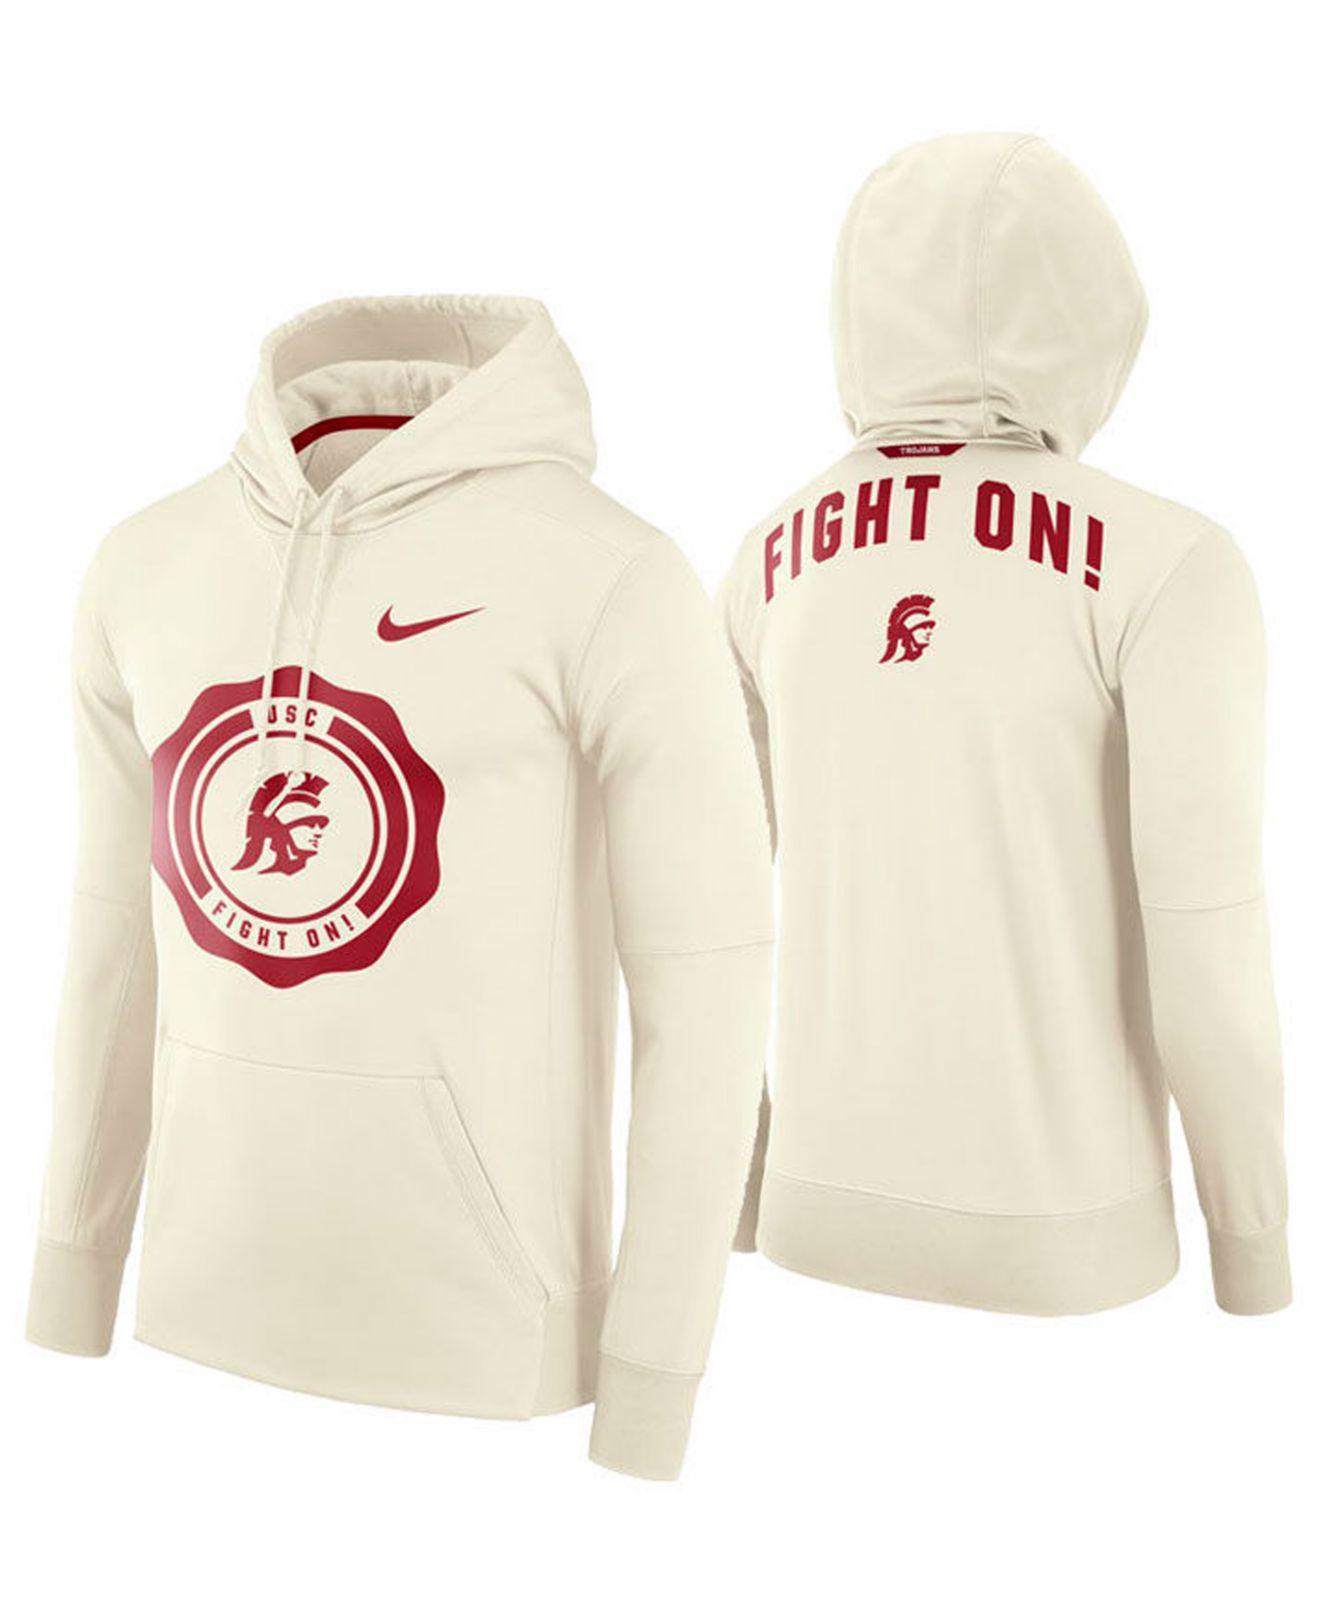 06efeb0aa6e9 Lyst - Nike Usc Trojans Rivalry Therma Hooded Sweatshirt in Natural ...